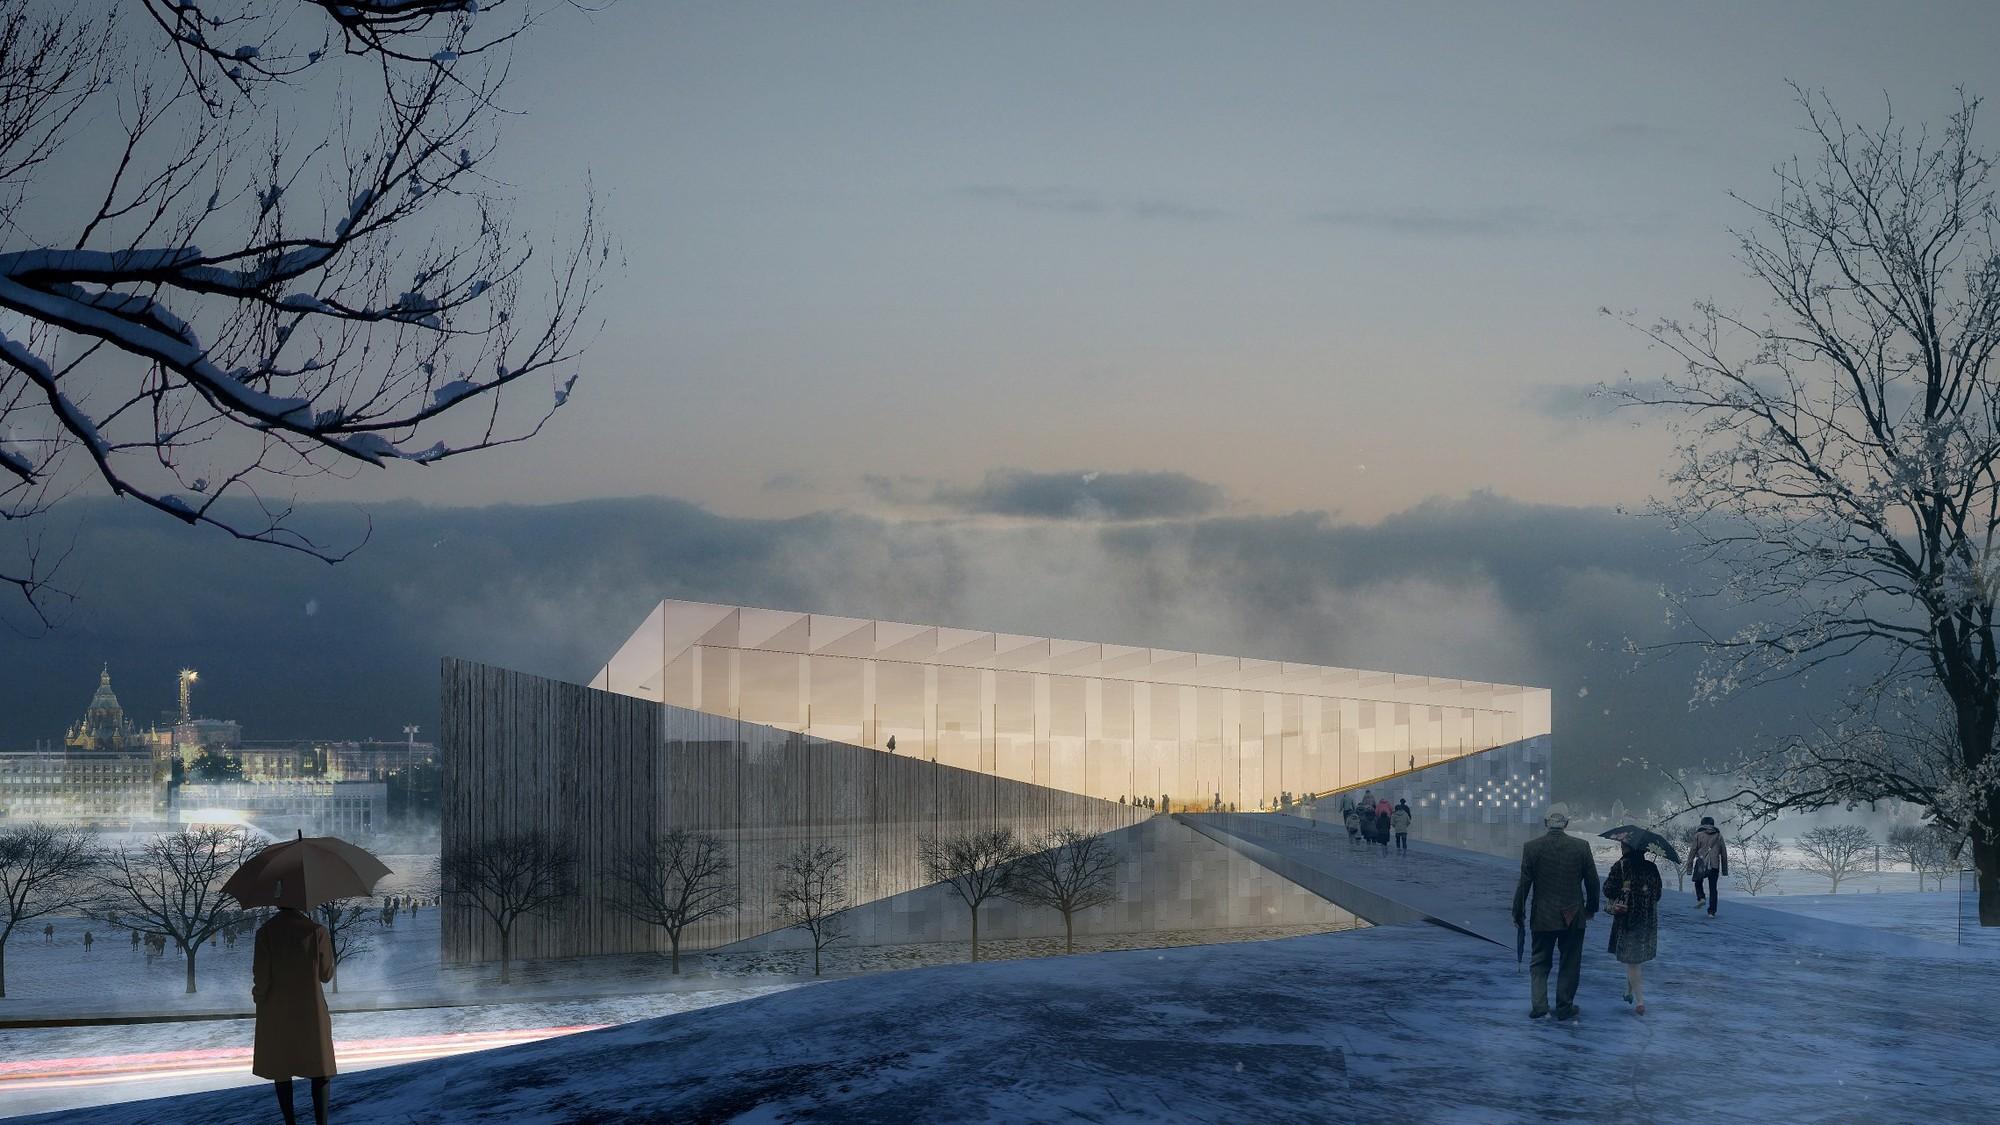 Proposta para o Museu Guggenheim Helsinki / Indio da Costa , Cortesia de Indio da Costa